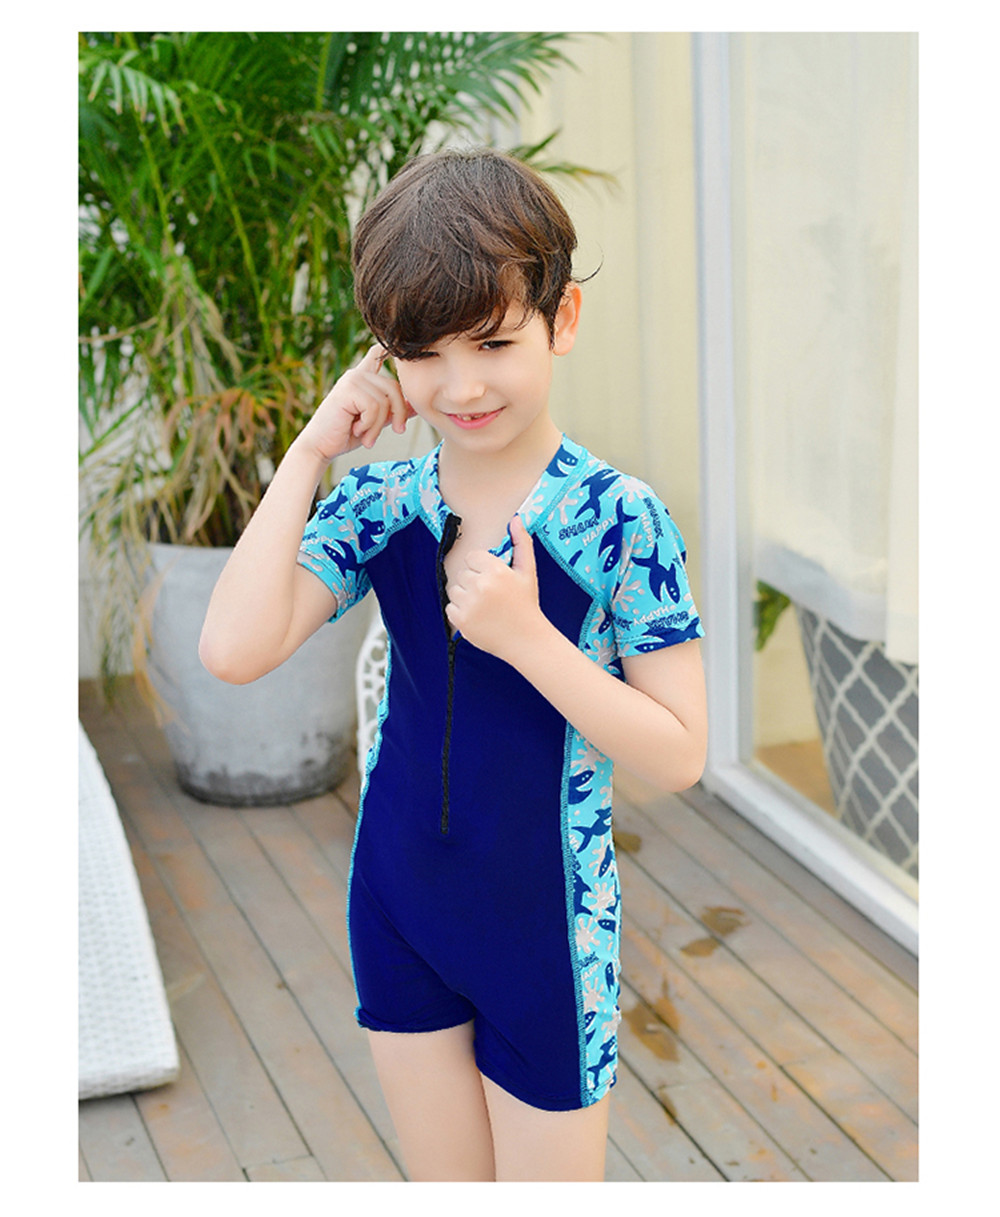 Child Swimwear One Piece Boys Swimsuits Cartoon Print Kids Bathing Suits Baby Boy Swimsuit Children Beach Wear With Back Zipper